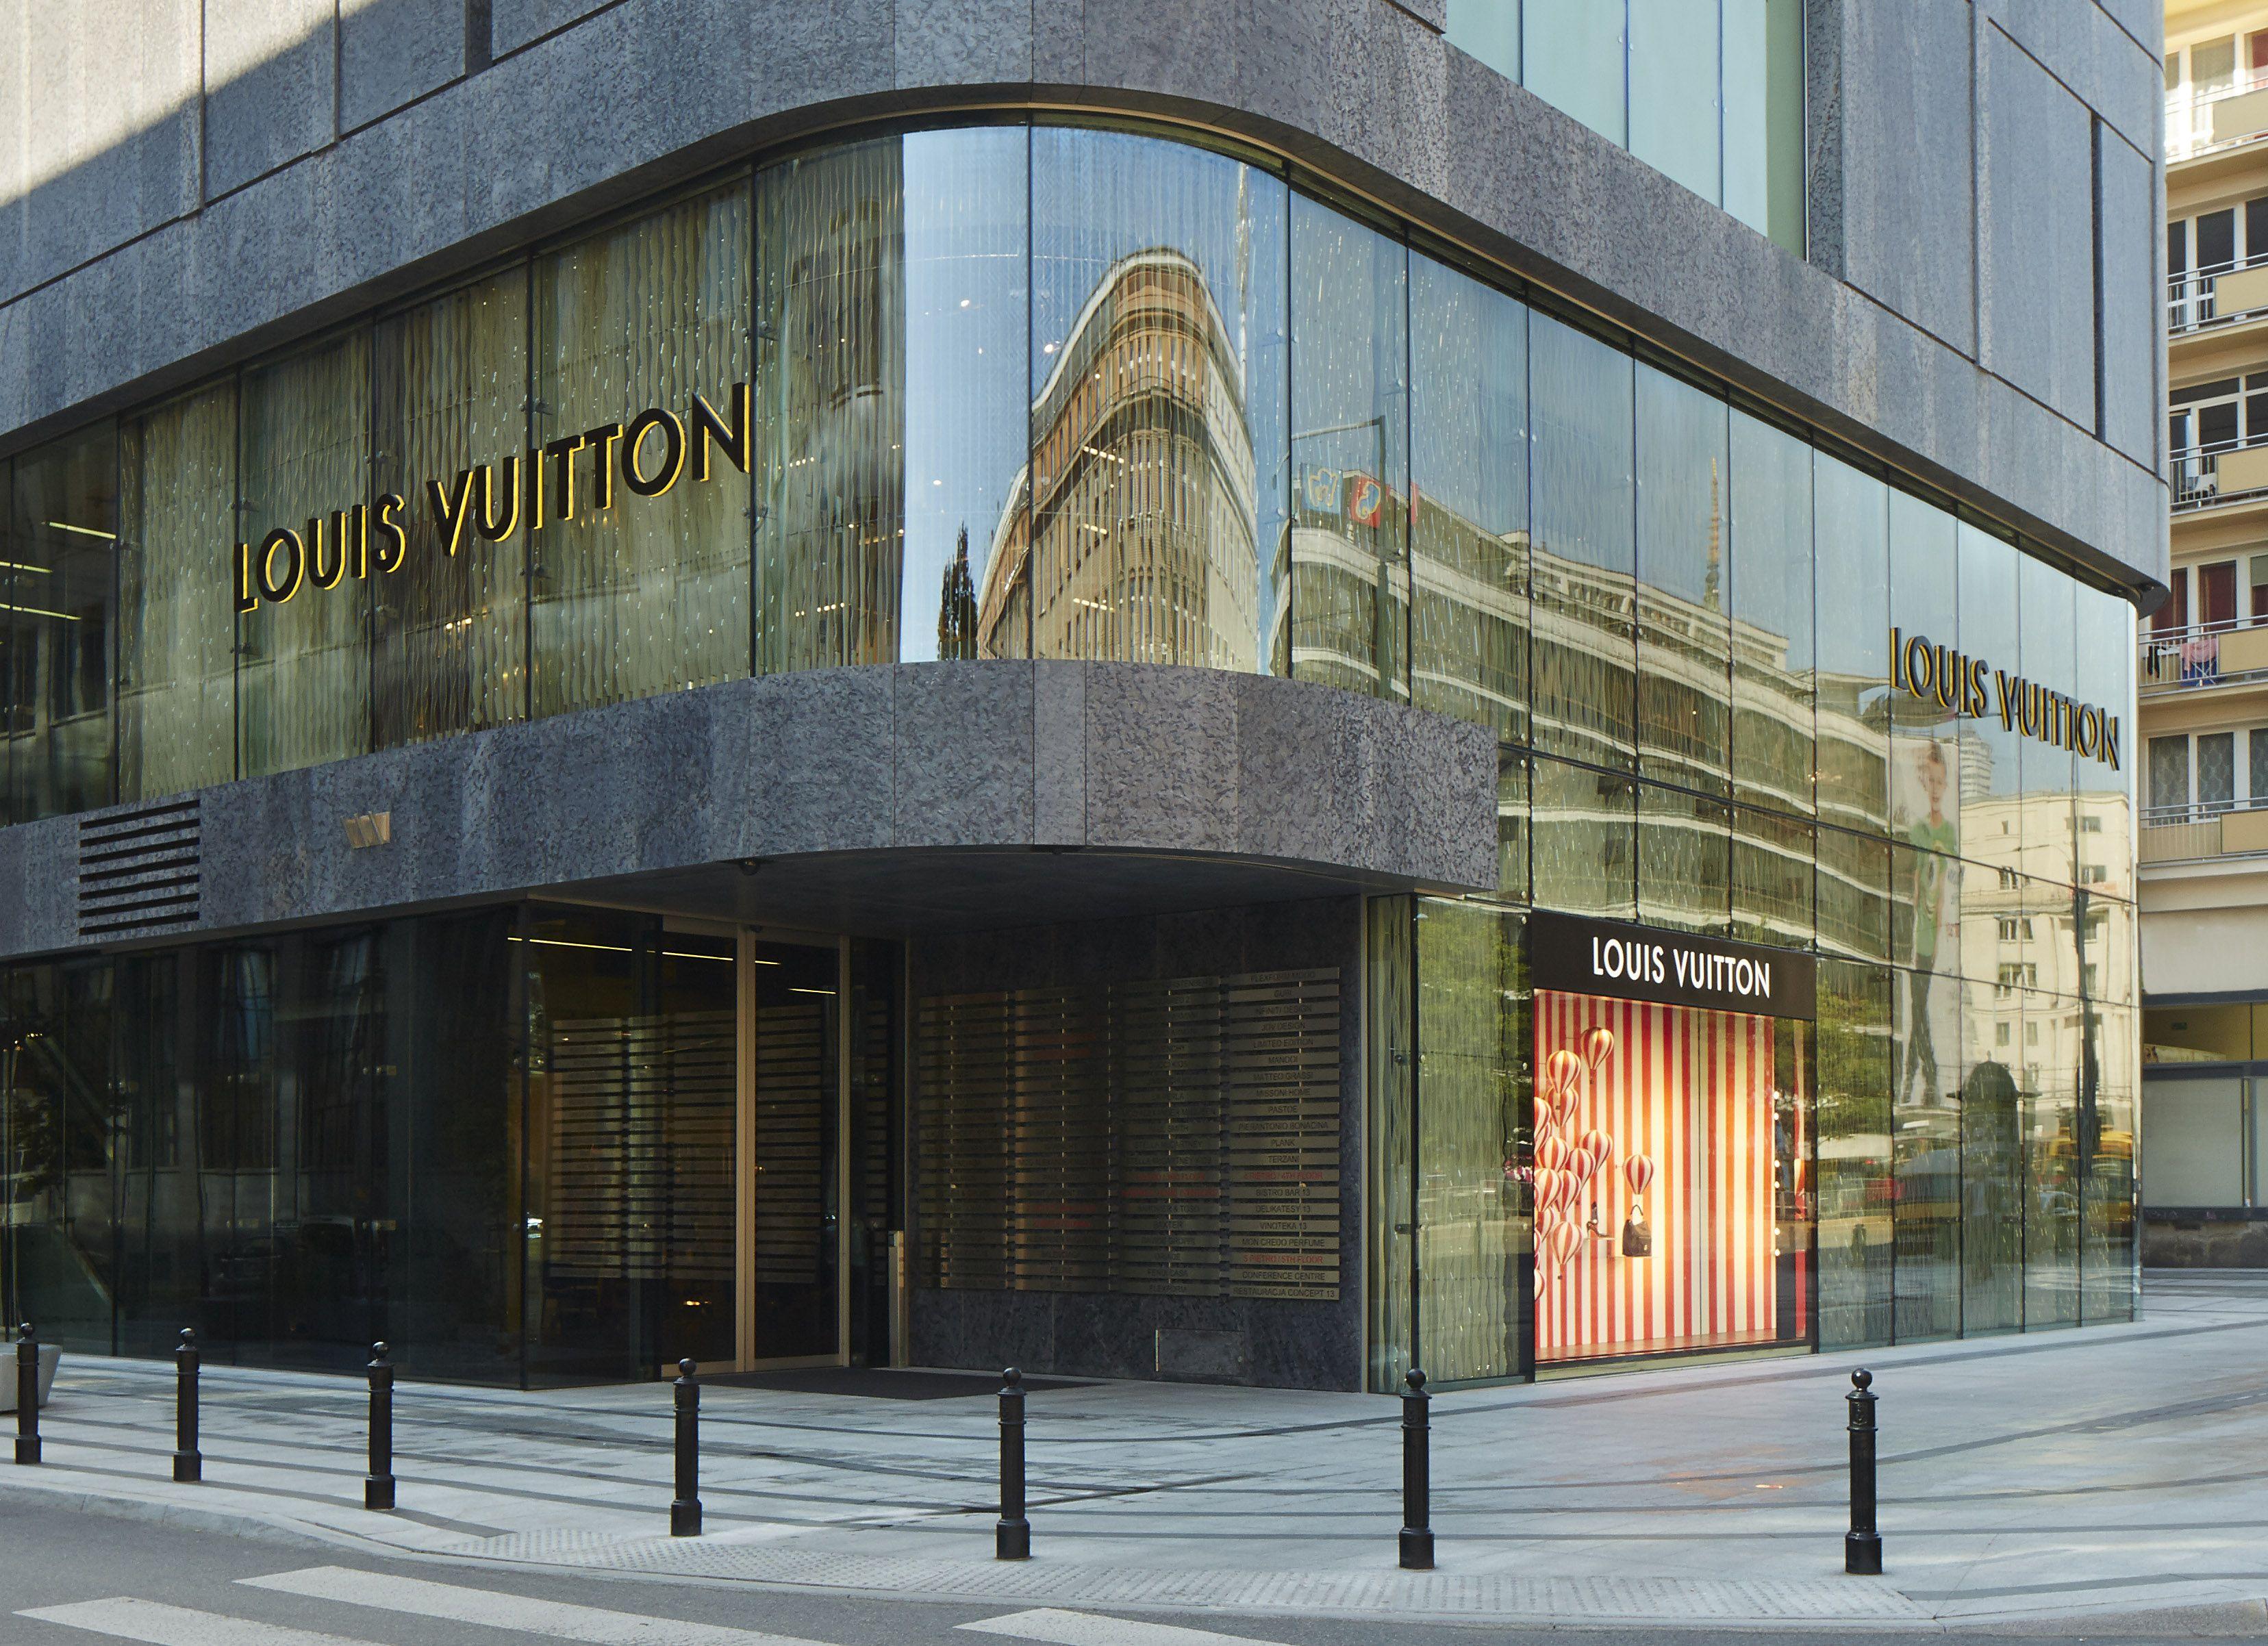 Sklep Louis Vuitton W Warszawie Vitkac Fot Materialy Prasowe Louis Vuitton Vuitton Louis